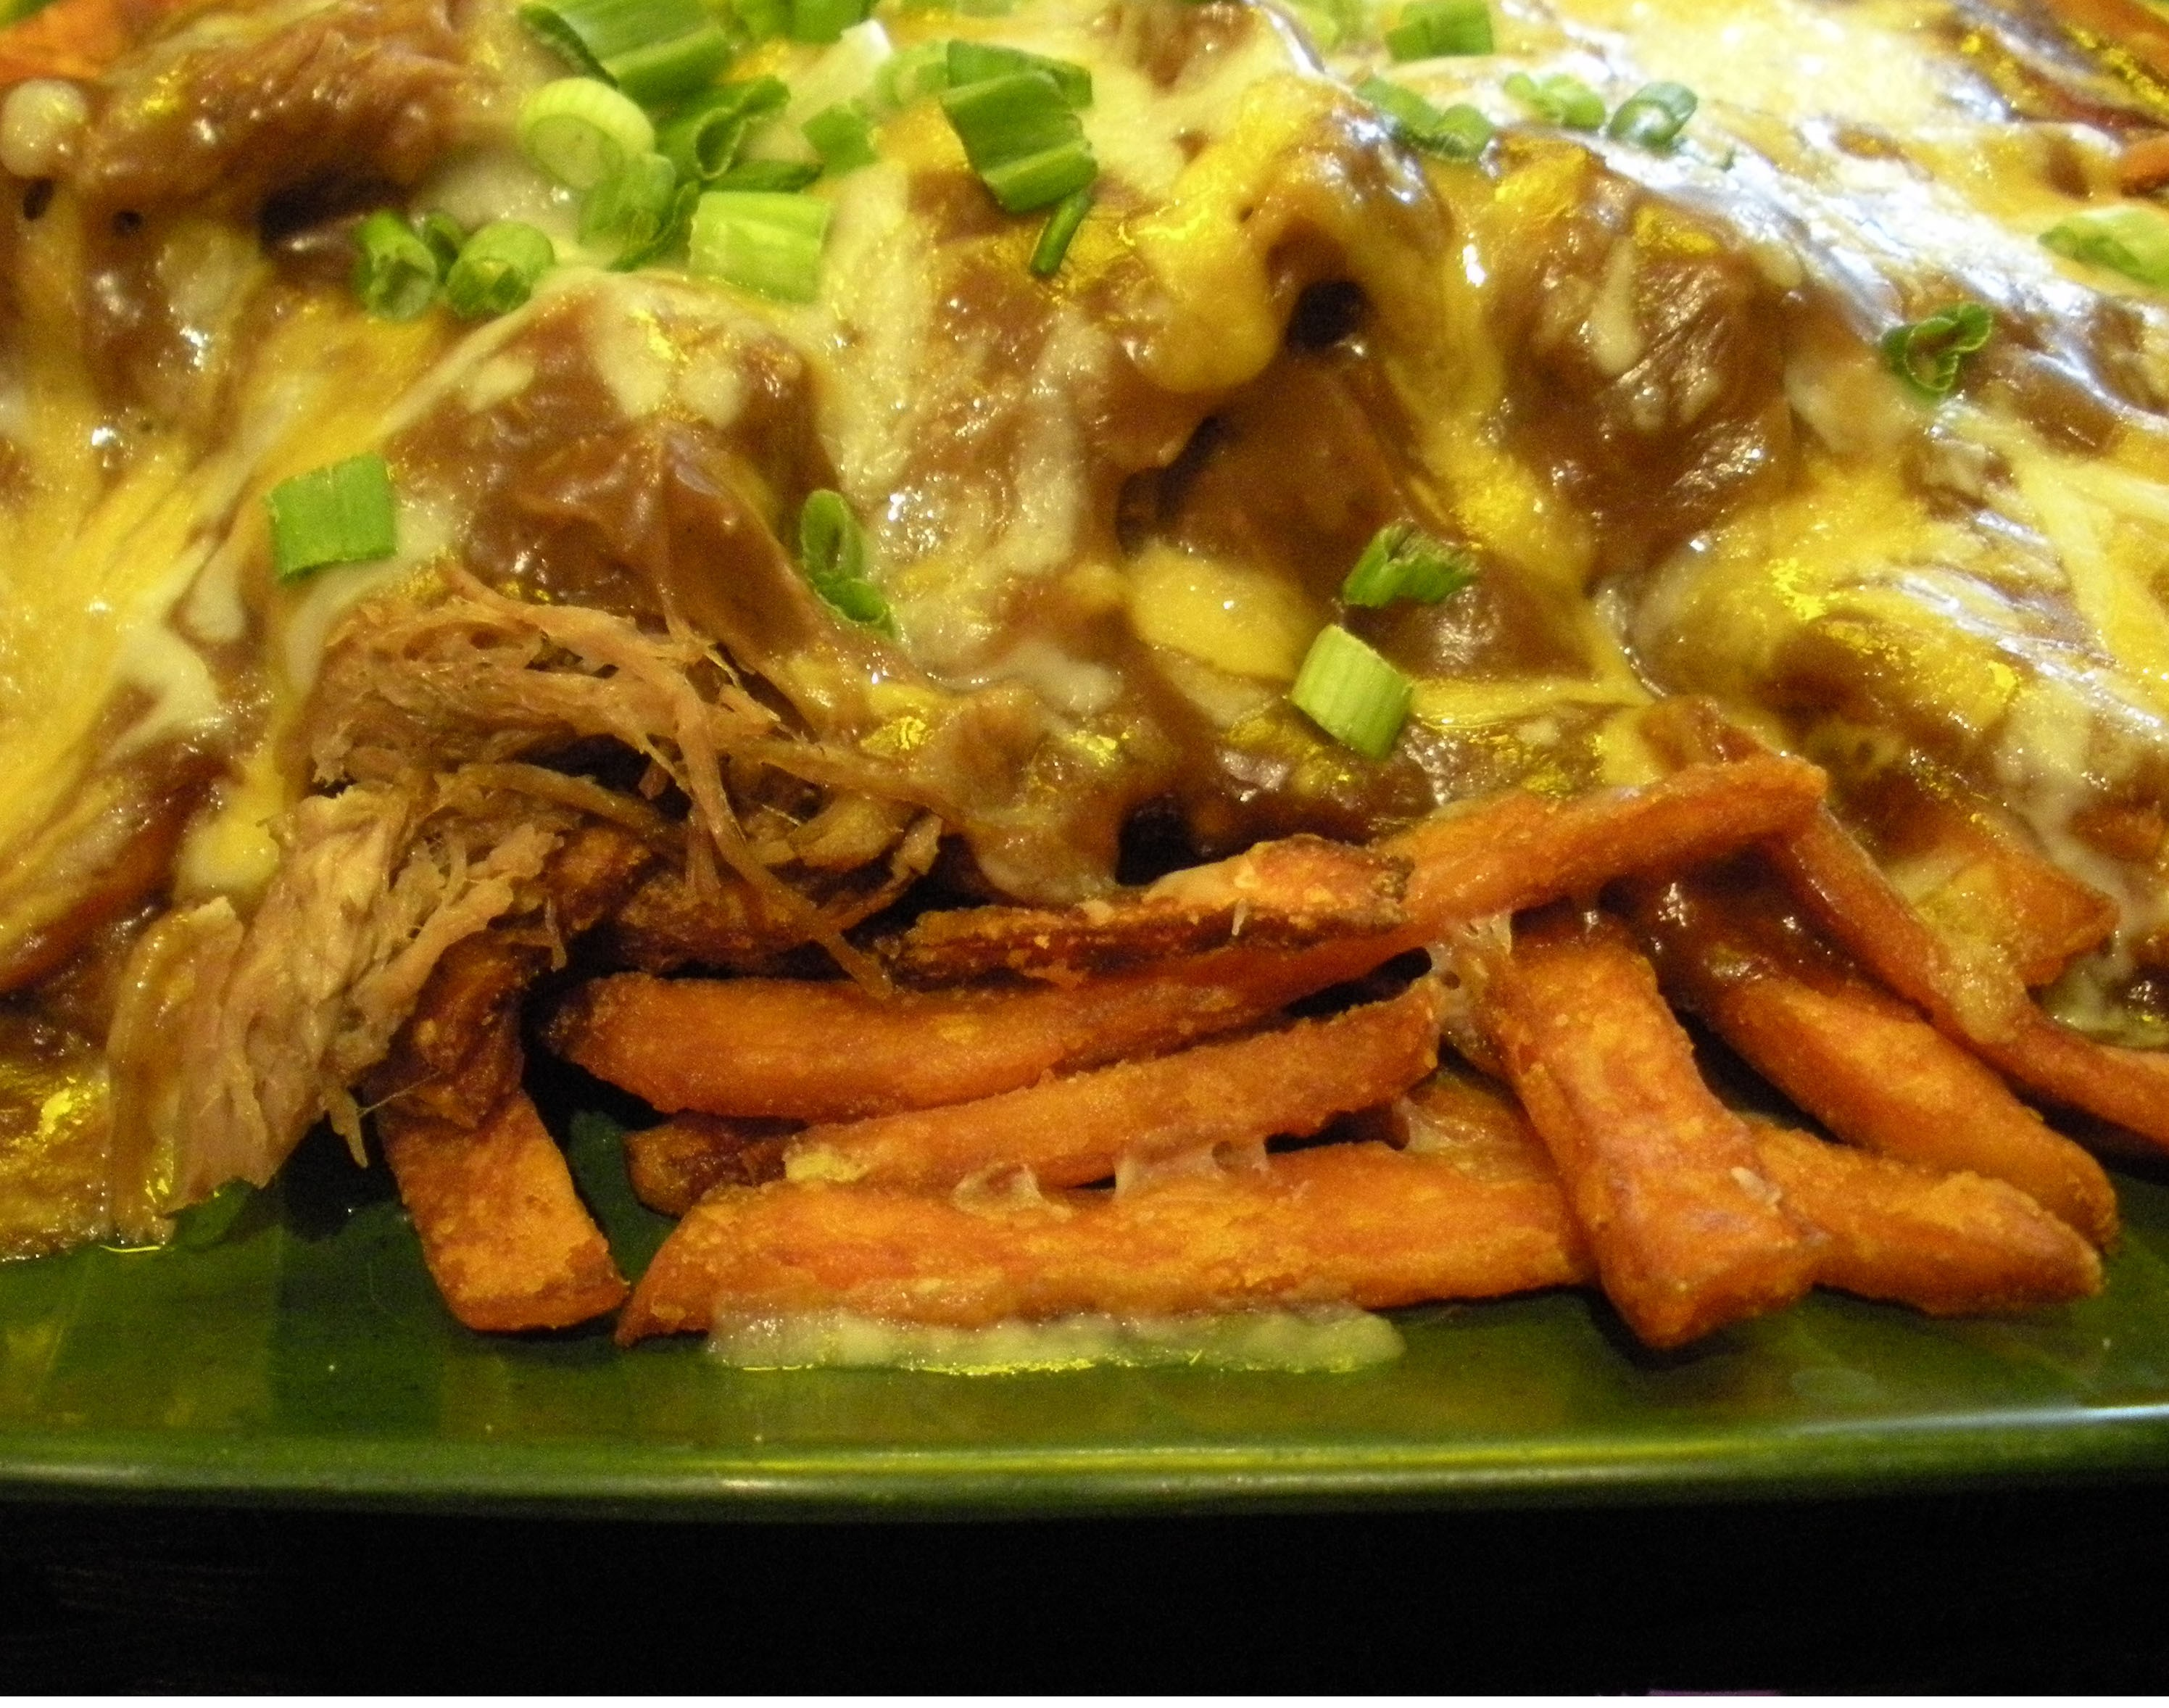 Sweet potato pig fries — what have I done? - JENNIFER FUMIKO CAHILL